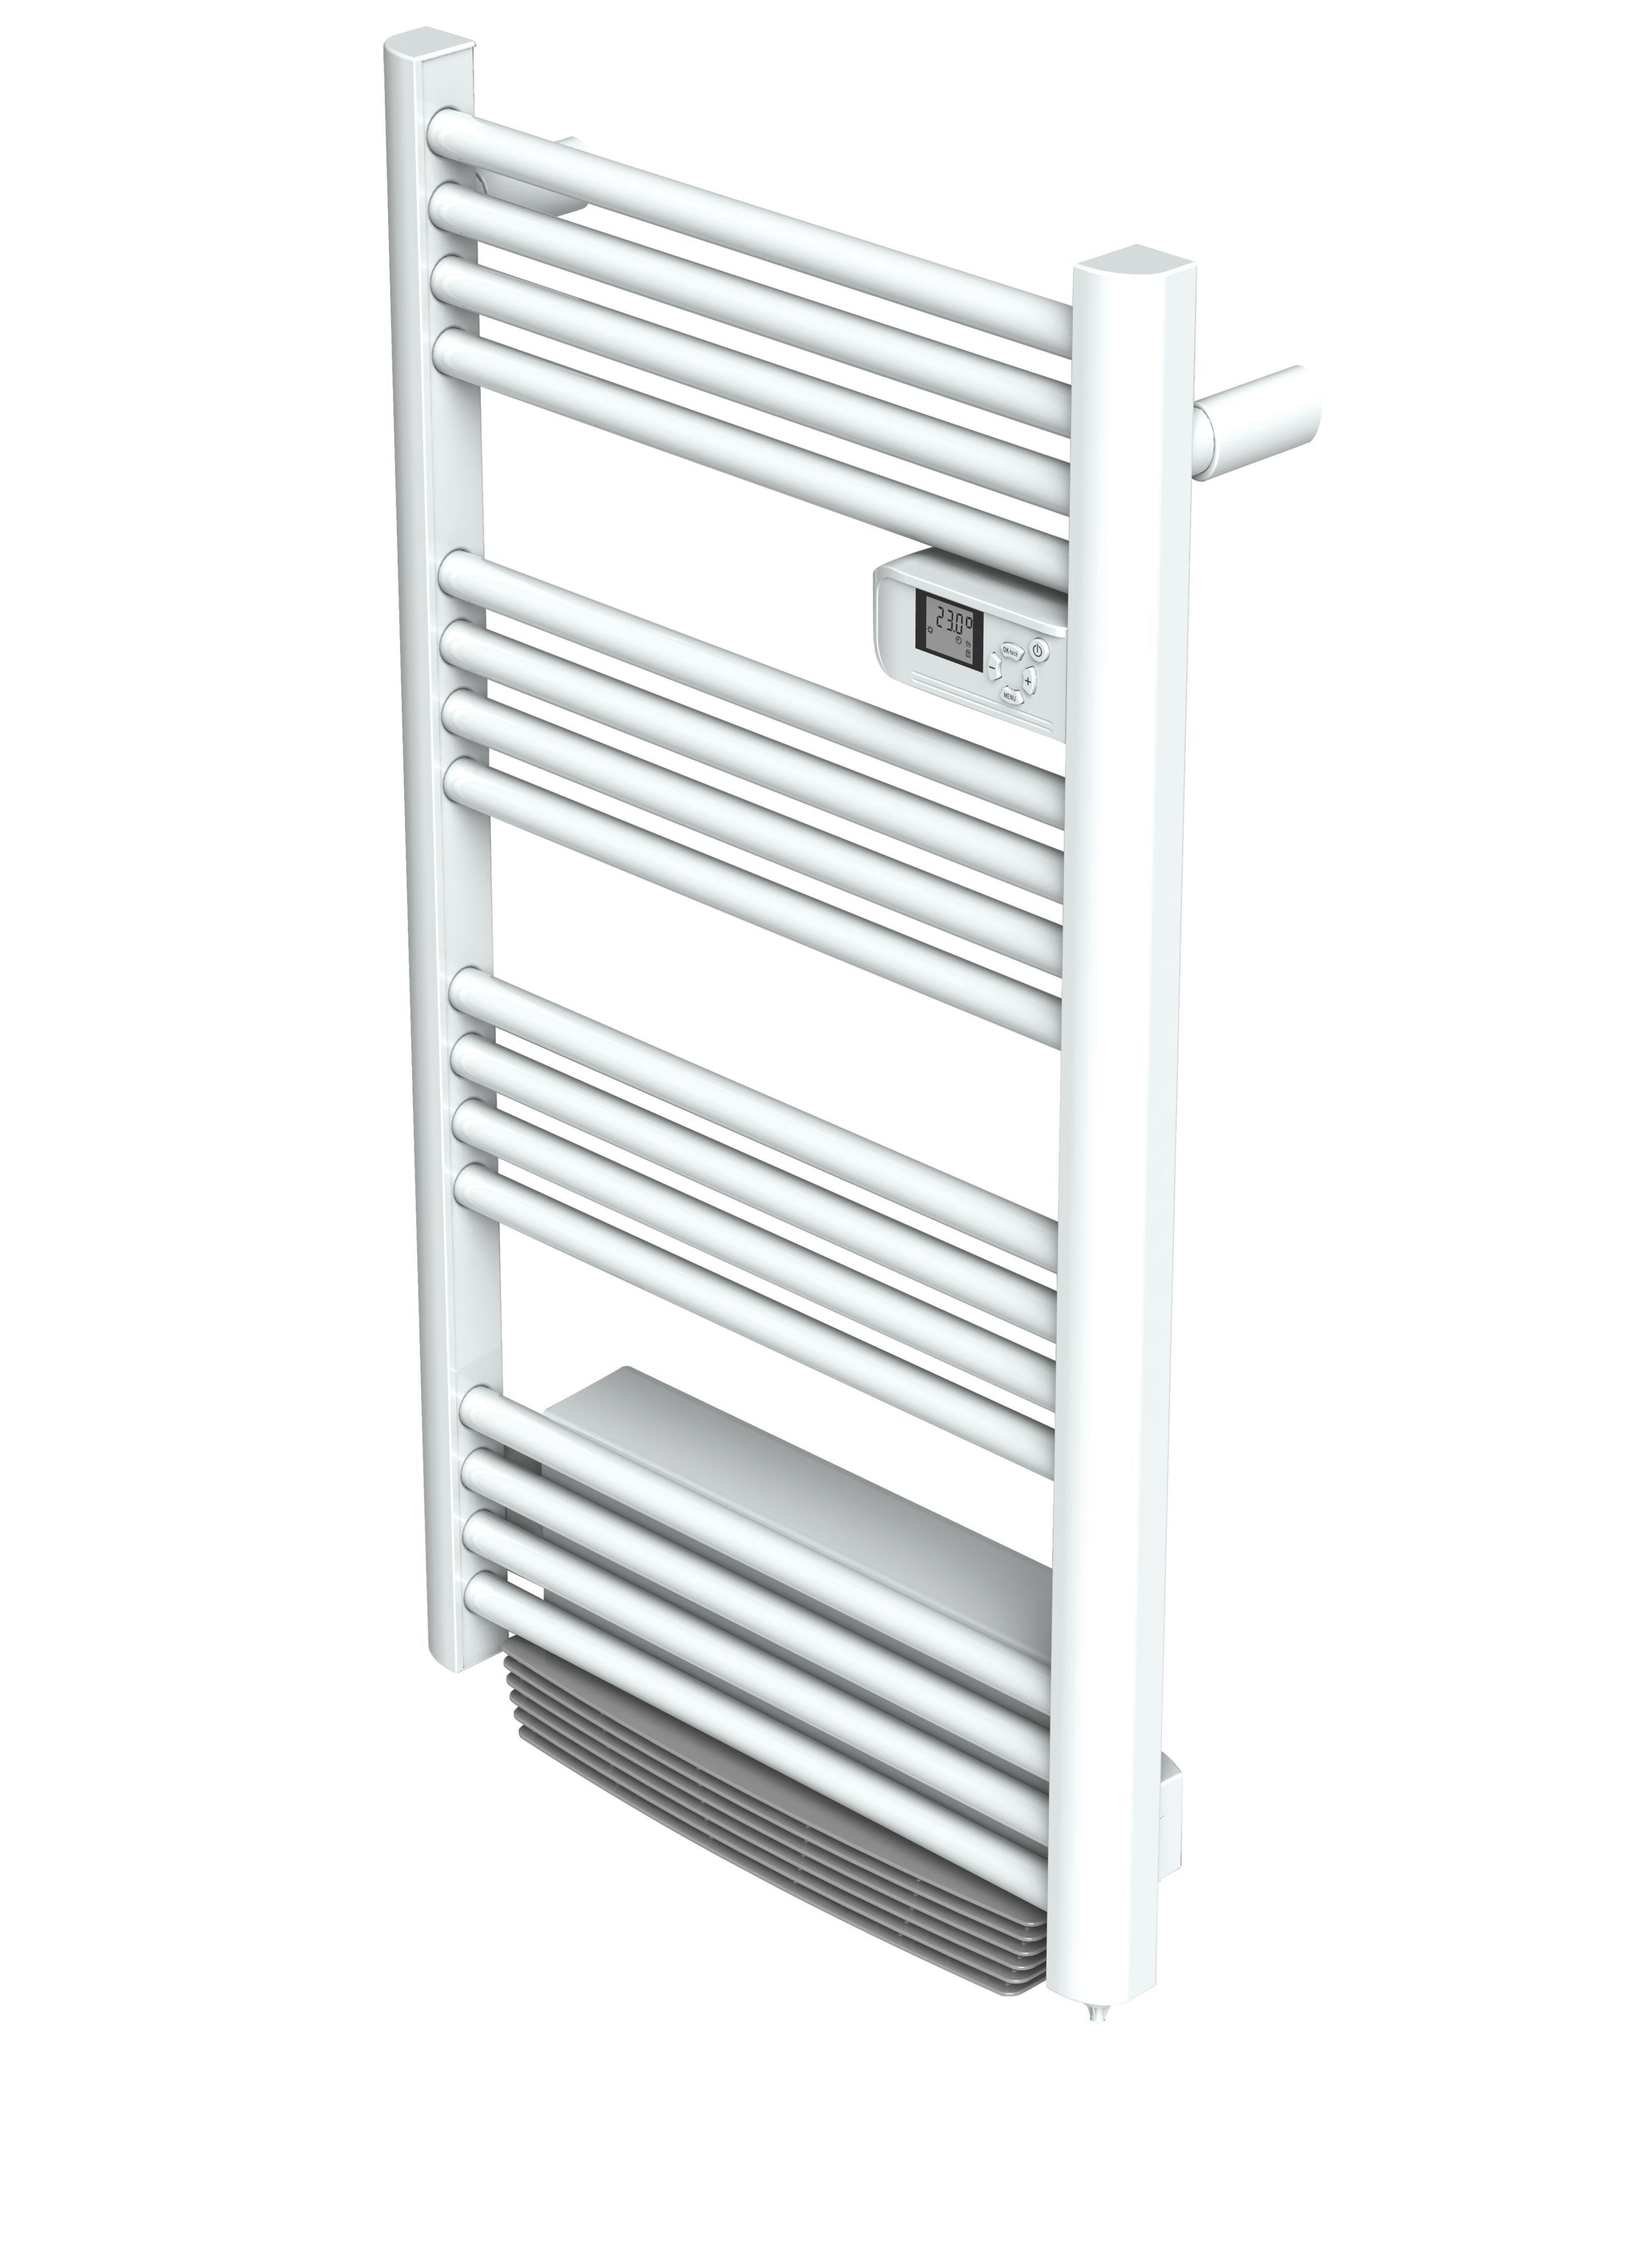 blyss 1500w white kita electrical towel warmer with blower